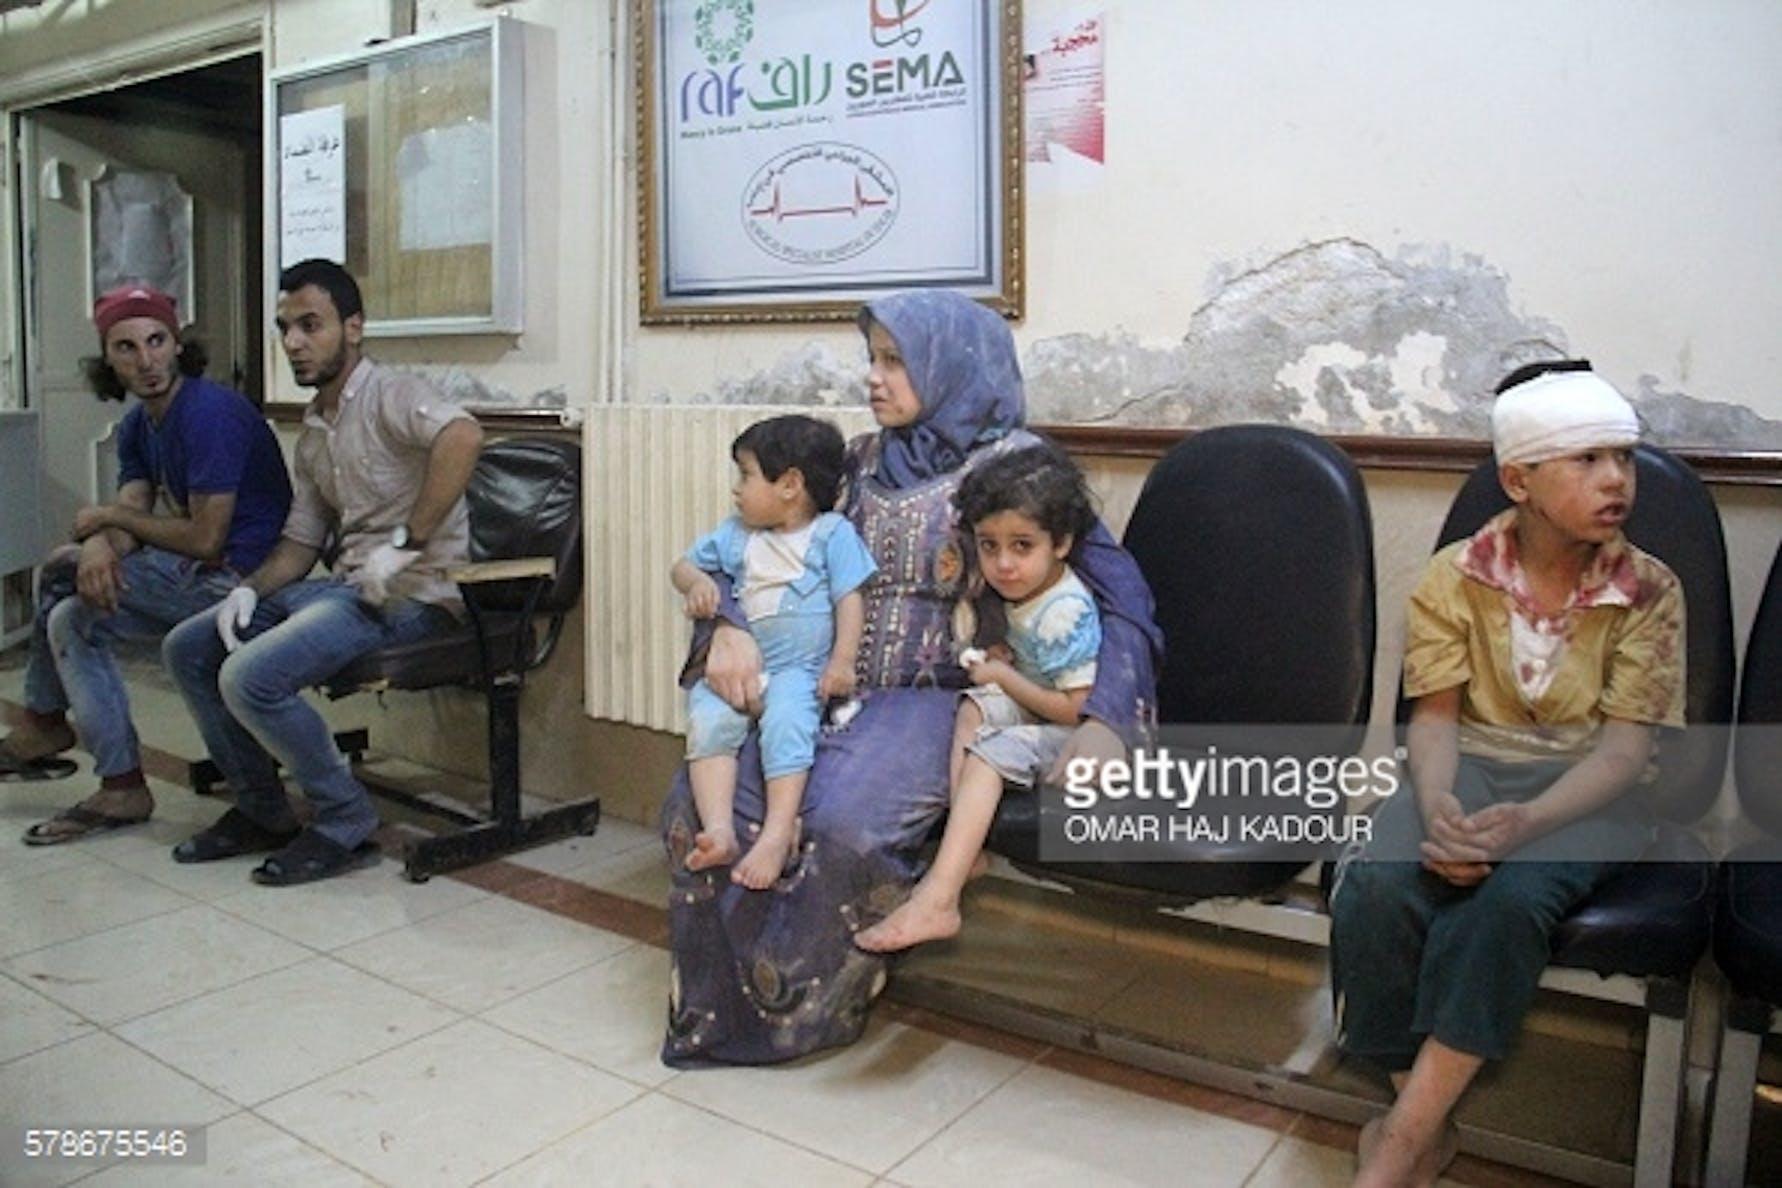 OMAR HAJ KADOUR/AFP/Getty Images